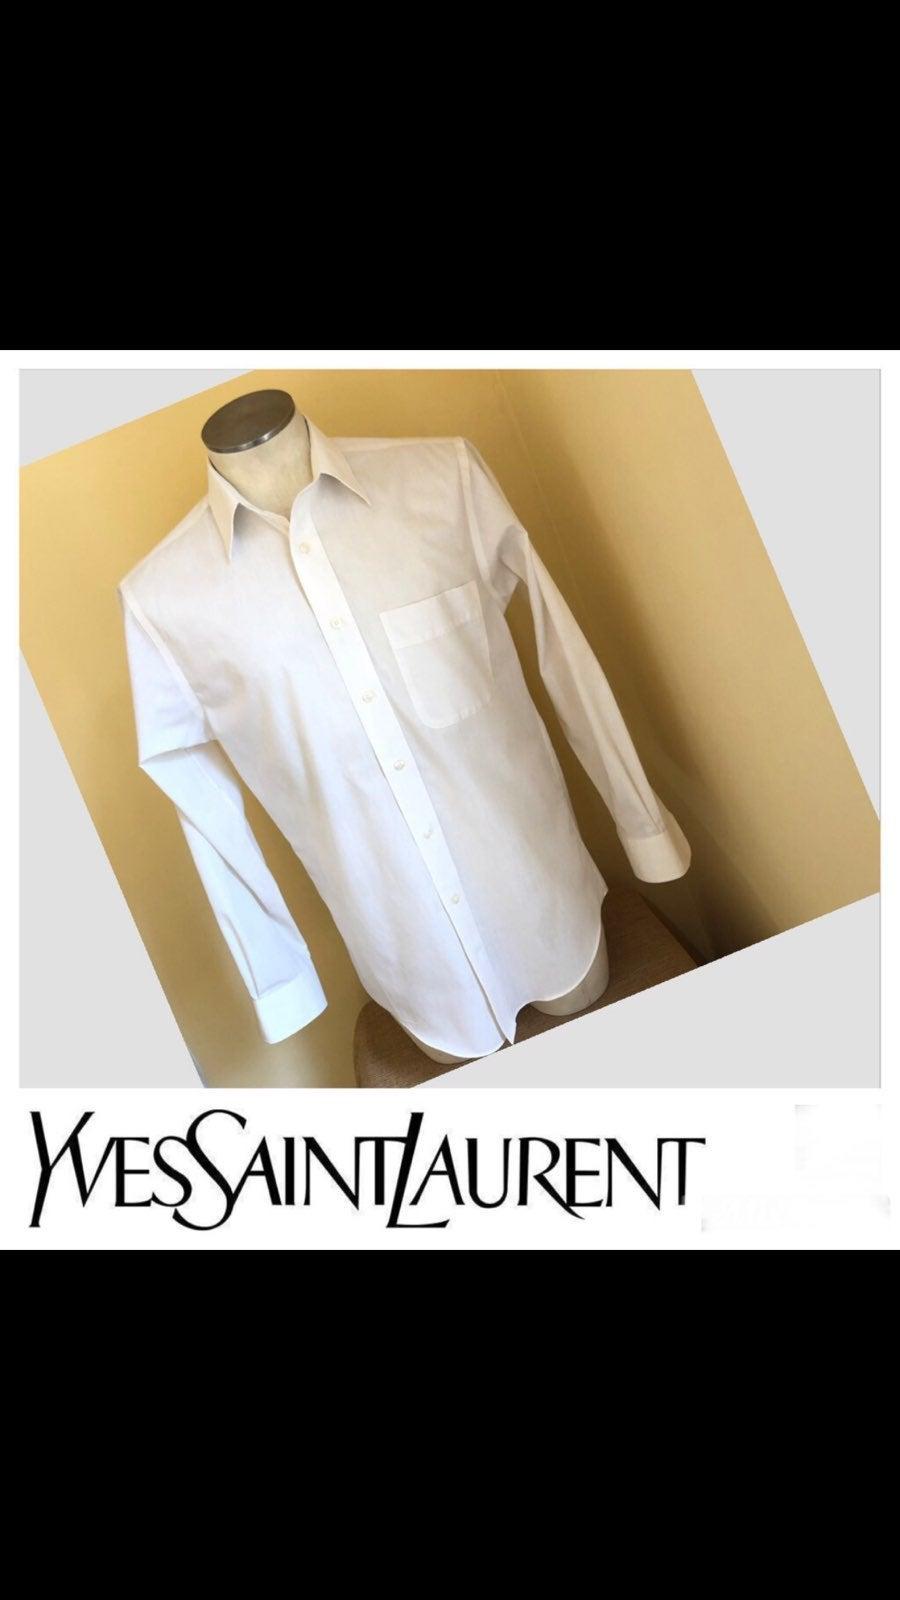 Yves Saint Laurent Button Down Shirt 15